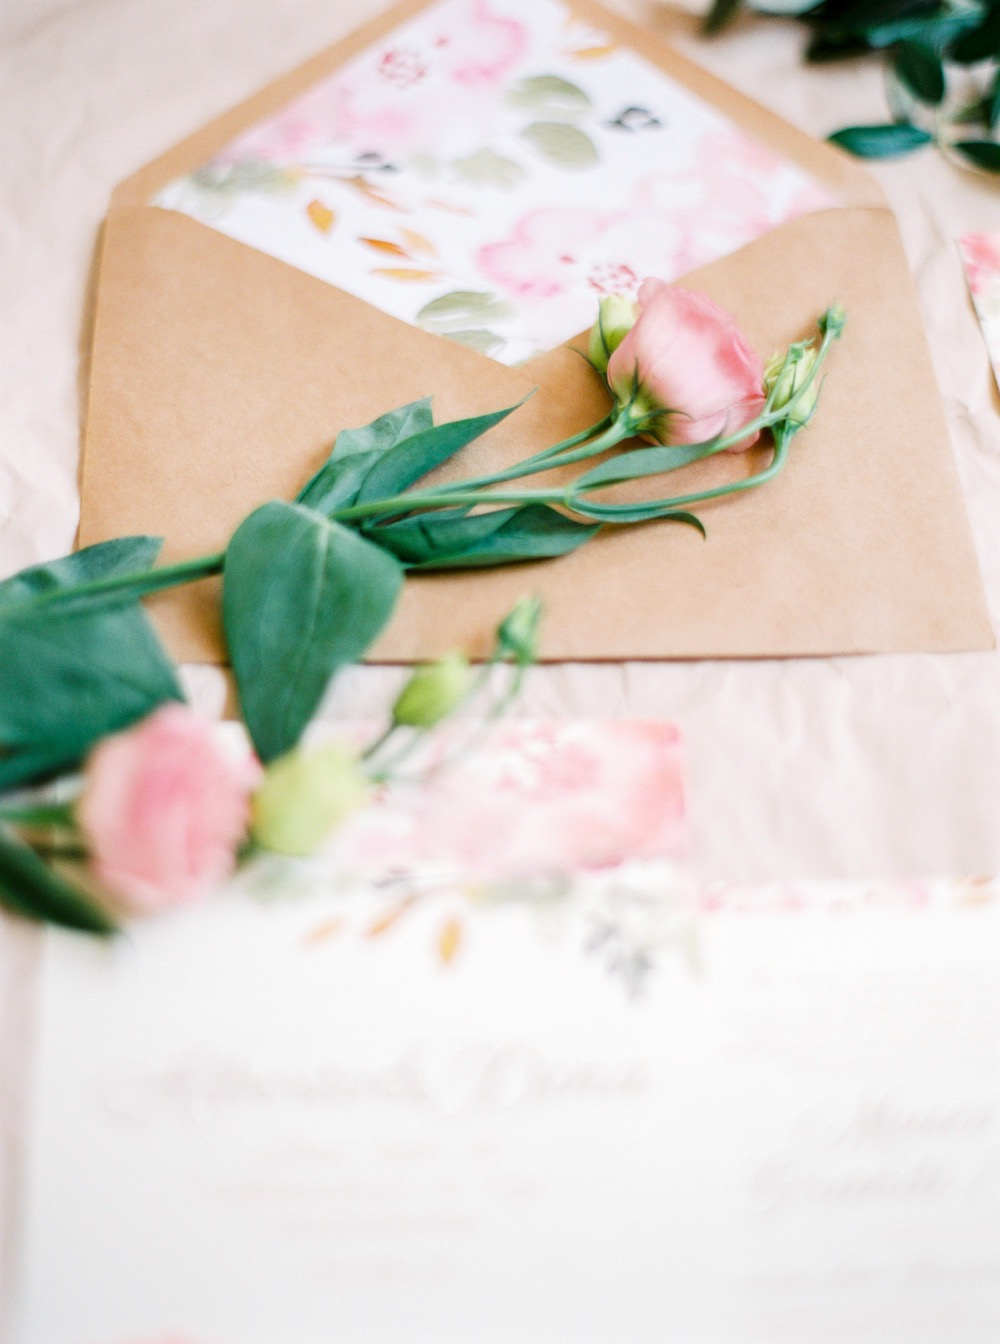 darya kamalova thecablookfotolab fine art film fhotographer in italy destination wedding como lake villa regina teodolinda villa pisani scalabrin-204